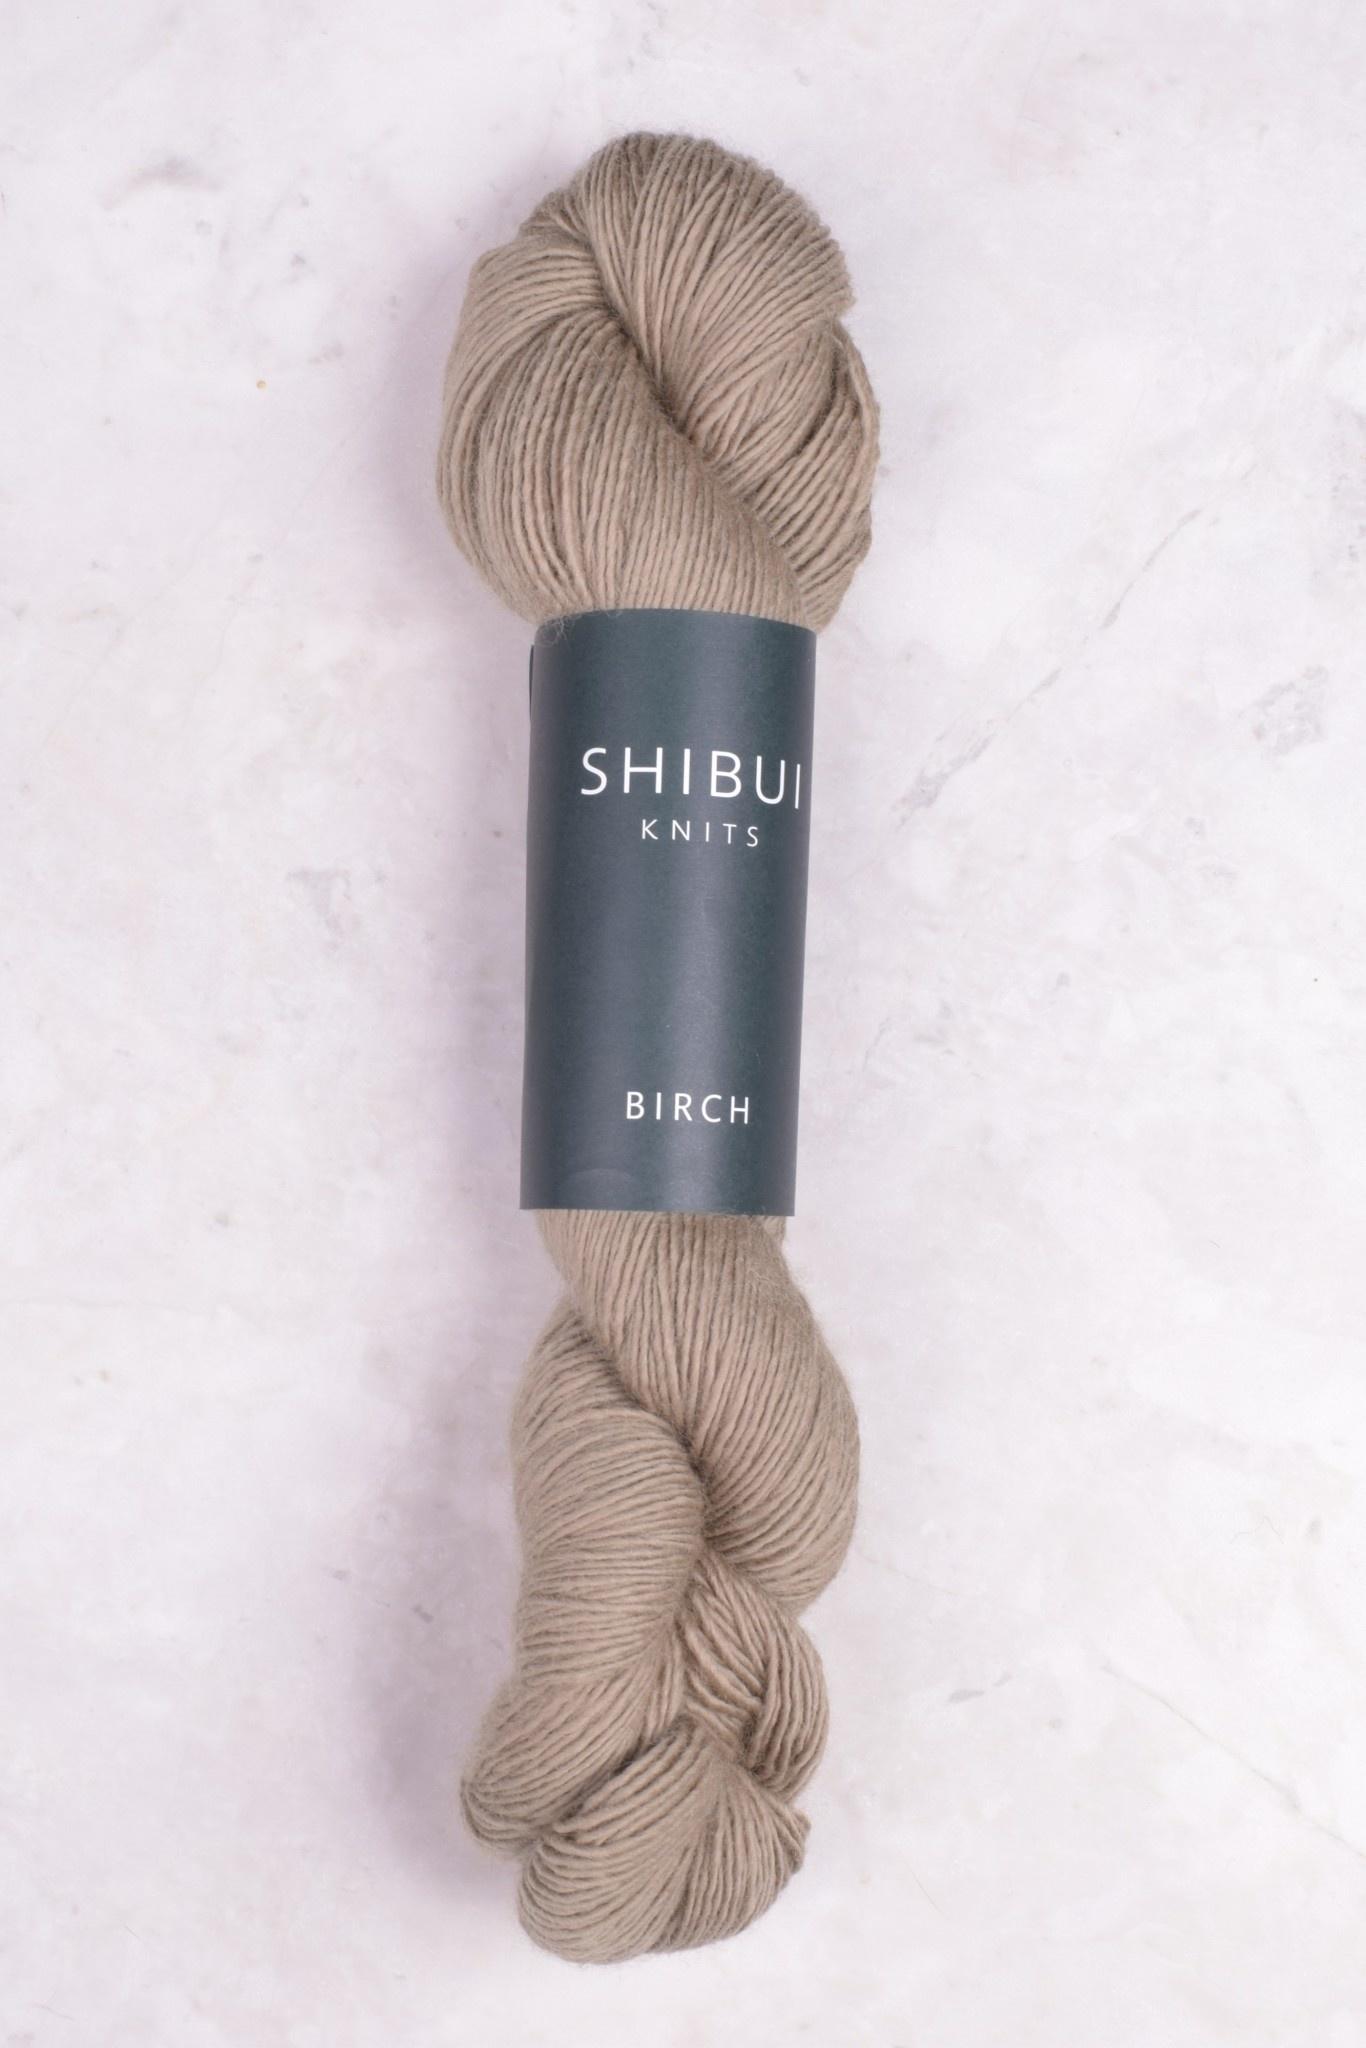 Image of Shibui Birch 13 Caffeine (Discontinued)